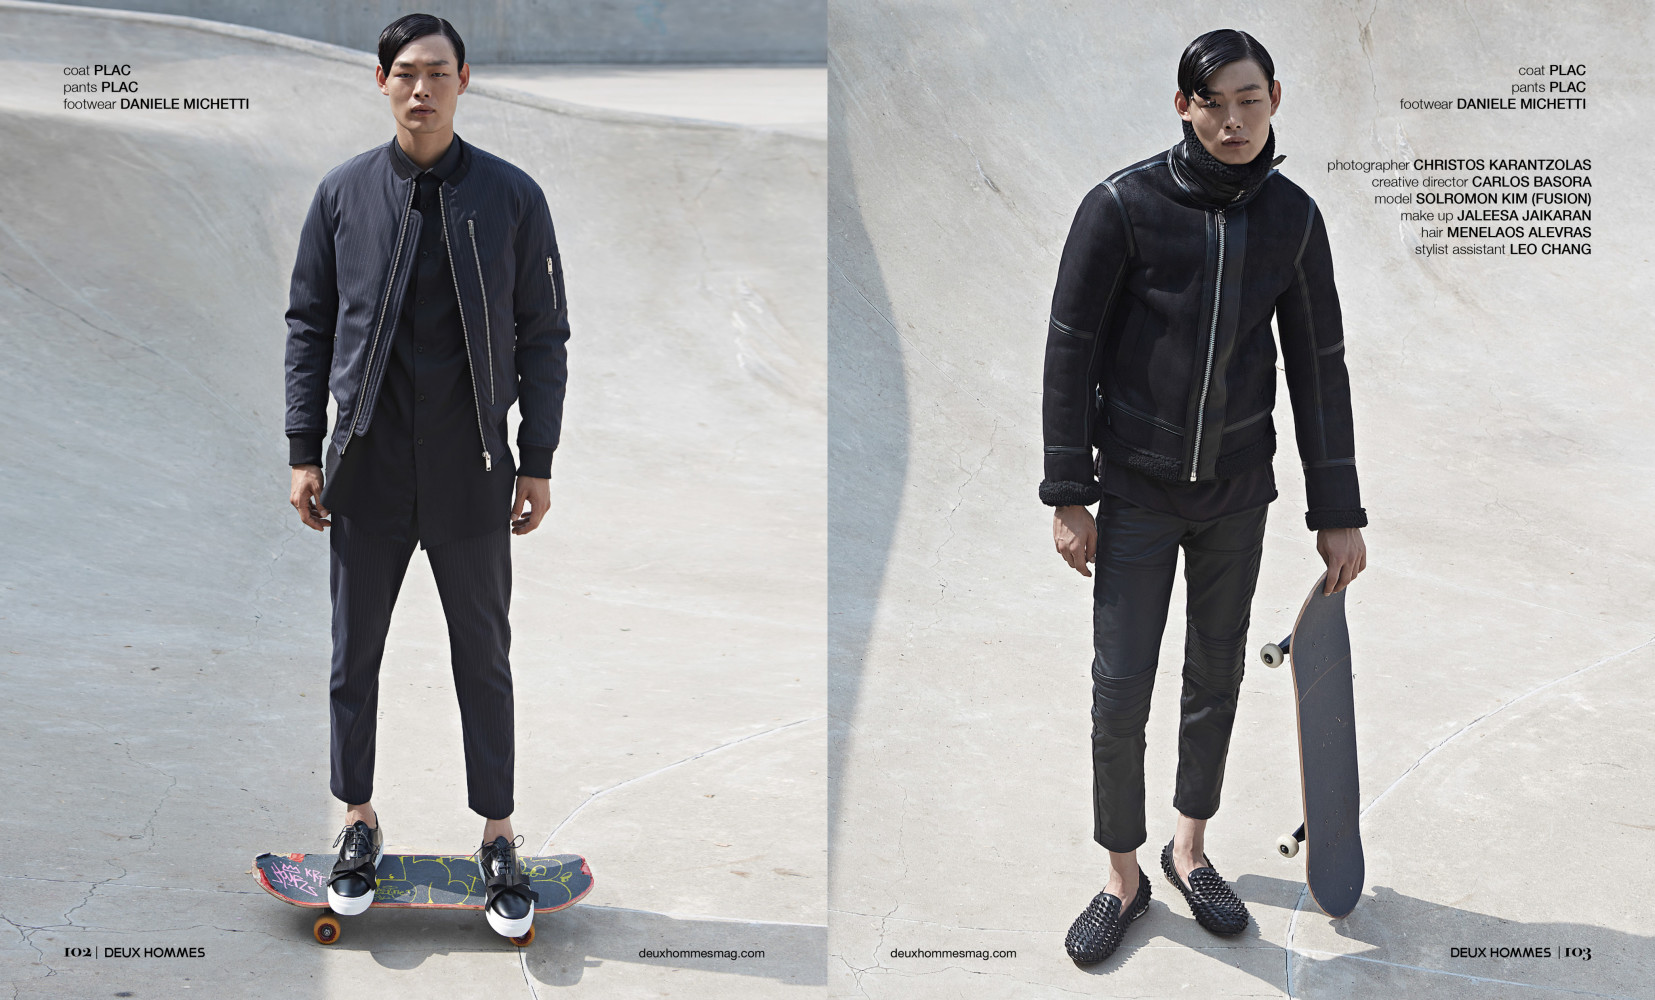 Leading-male-model-Solromon-Deux-Hommes-magazine-male-fashion-model-Top-London-modelling-agency-IMM